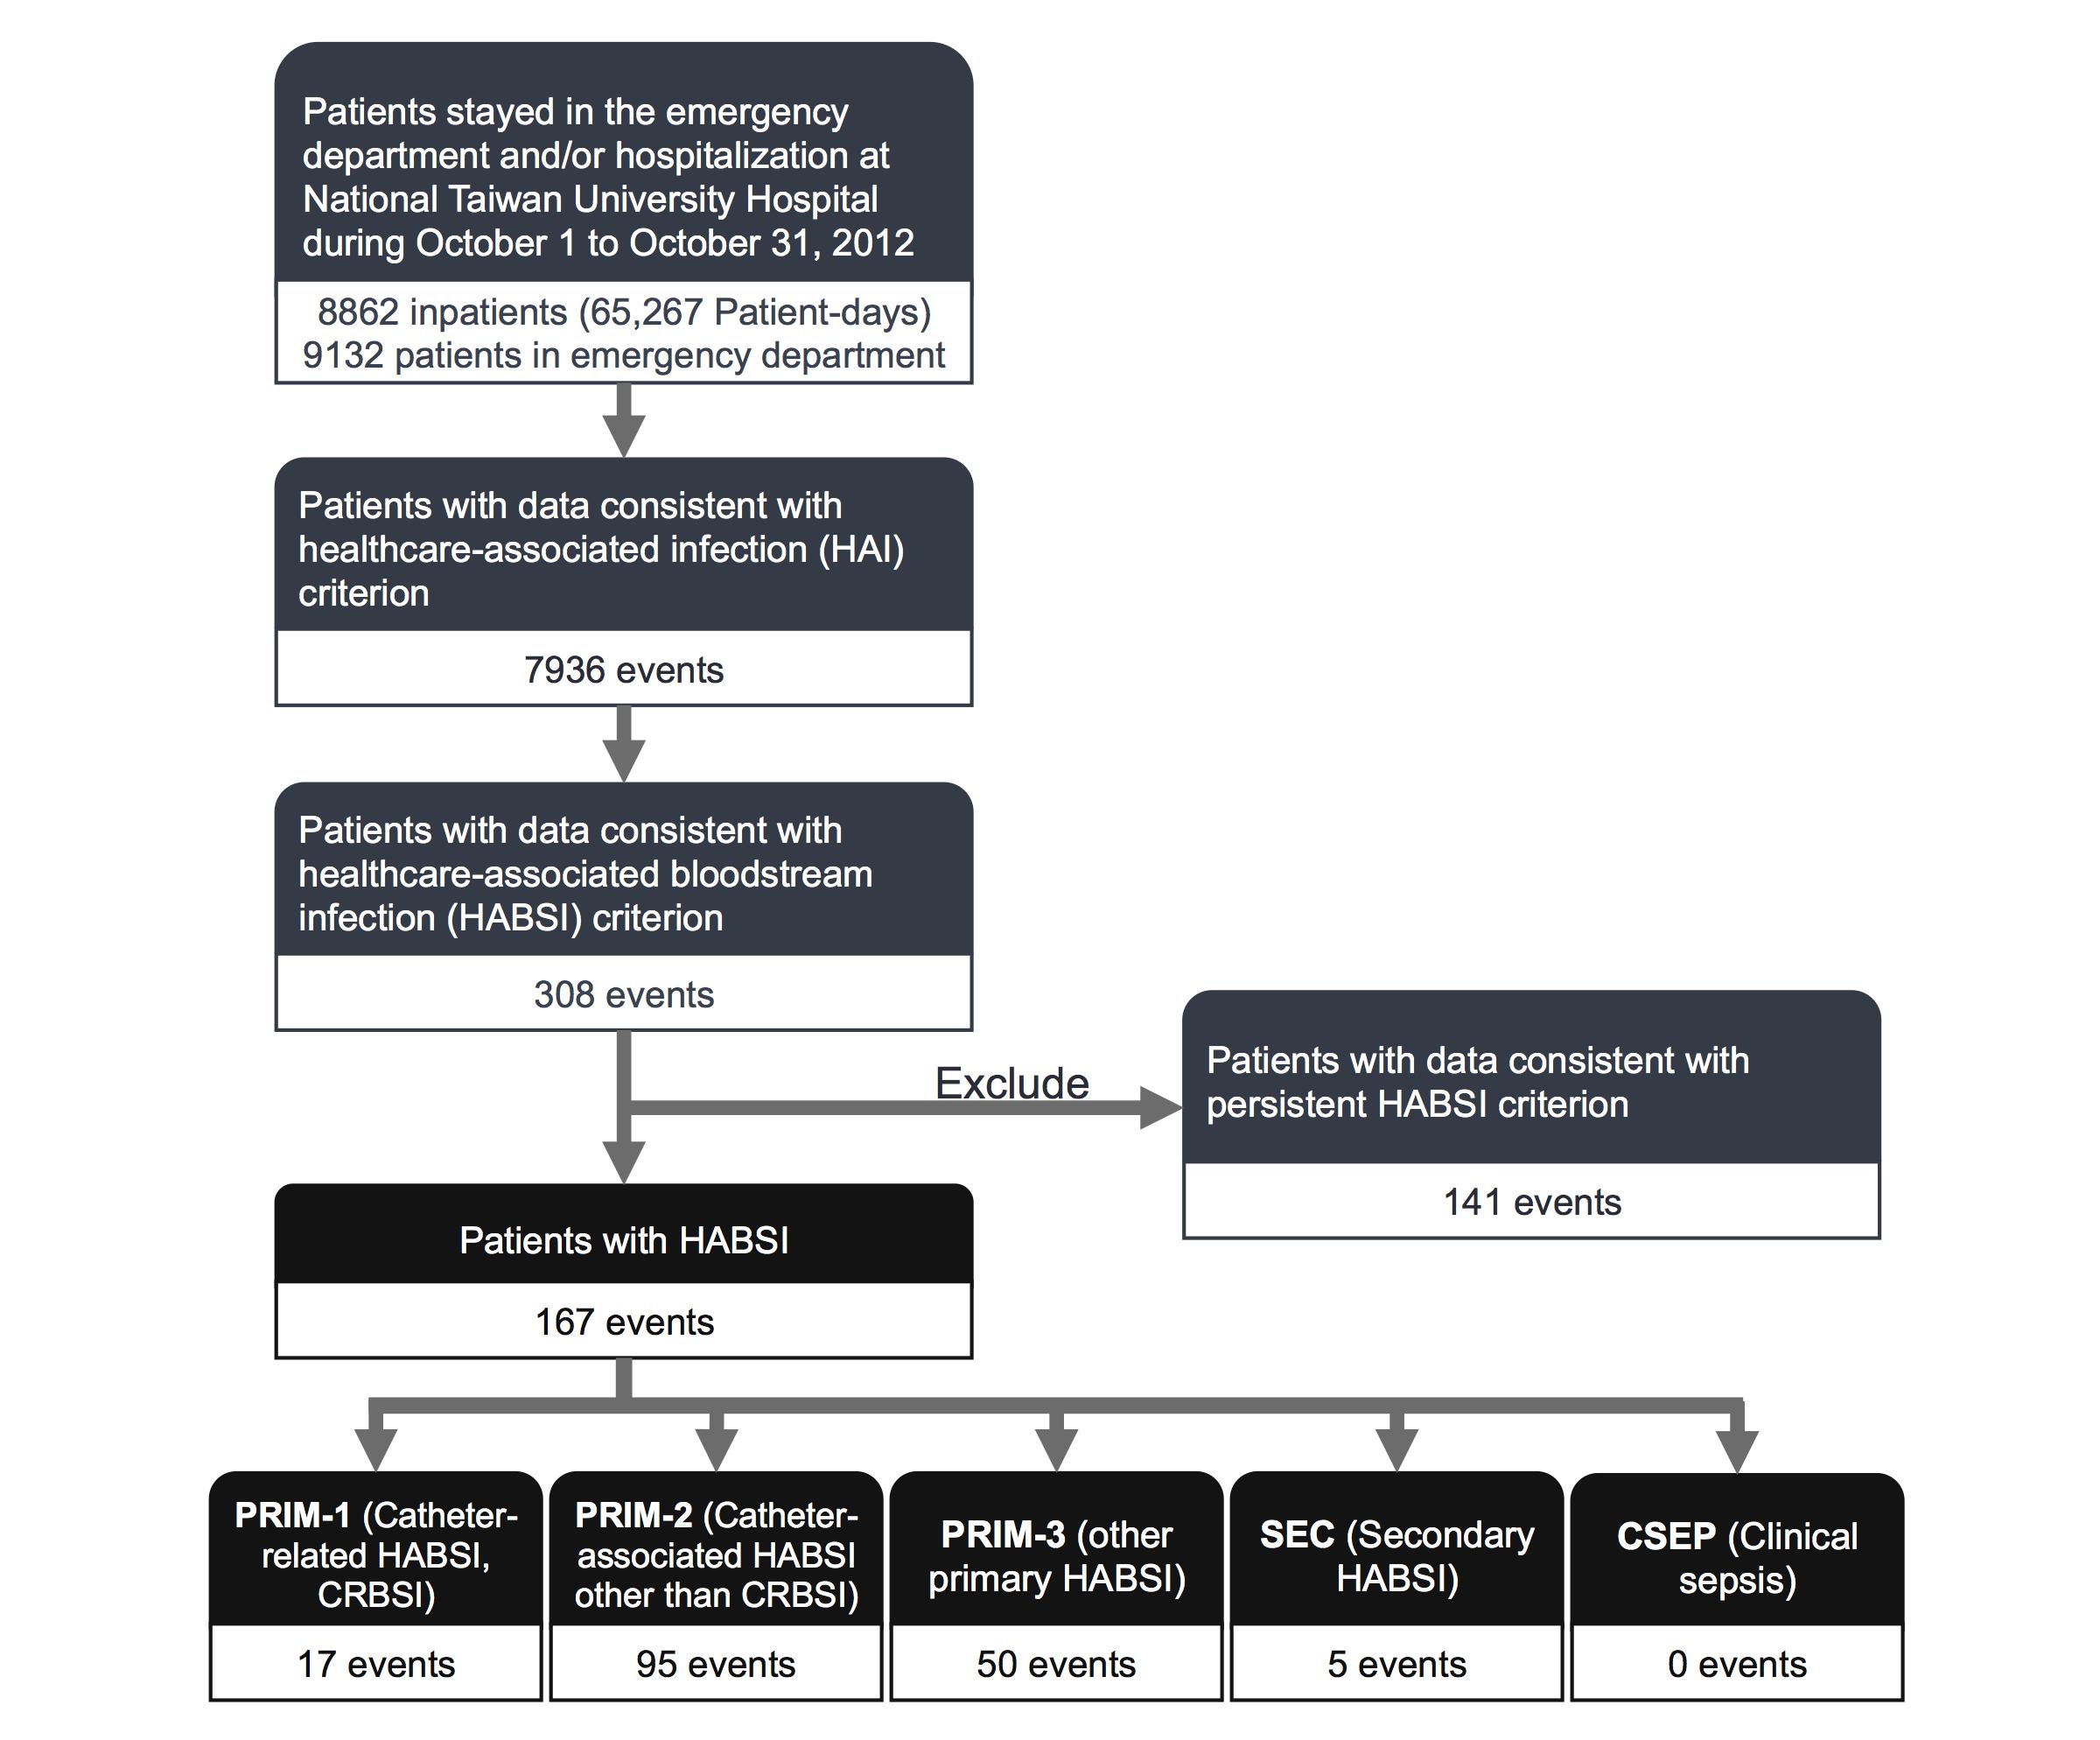 jmi-a web-based, hospital-wide health care-associated bloodstream